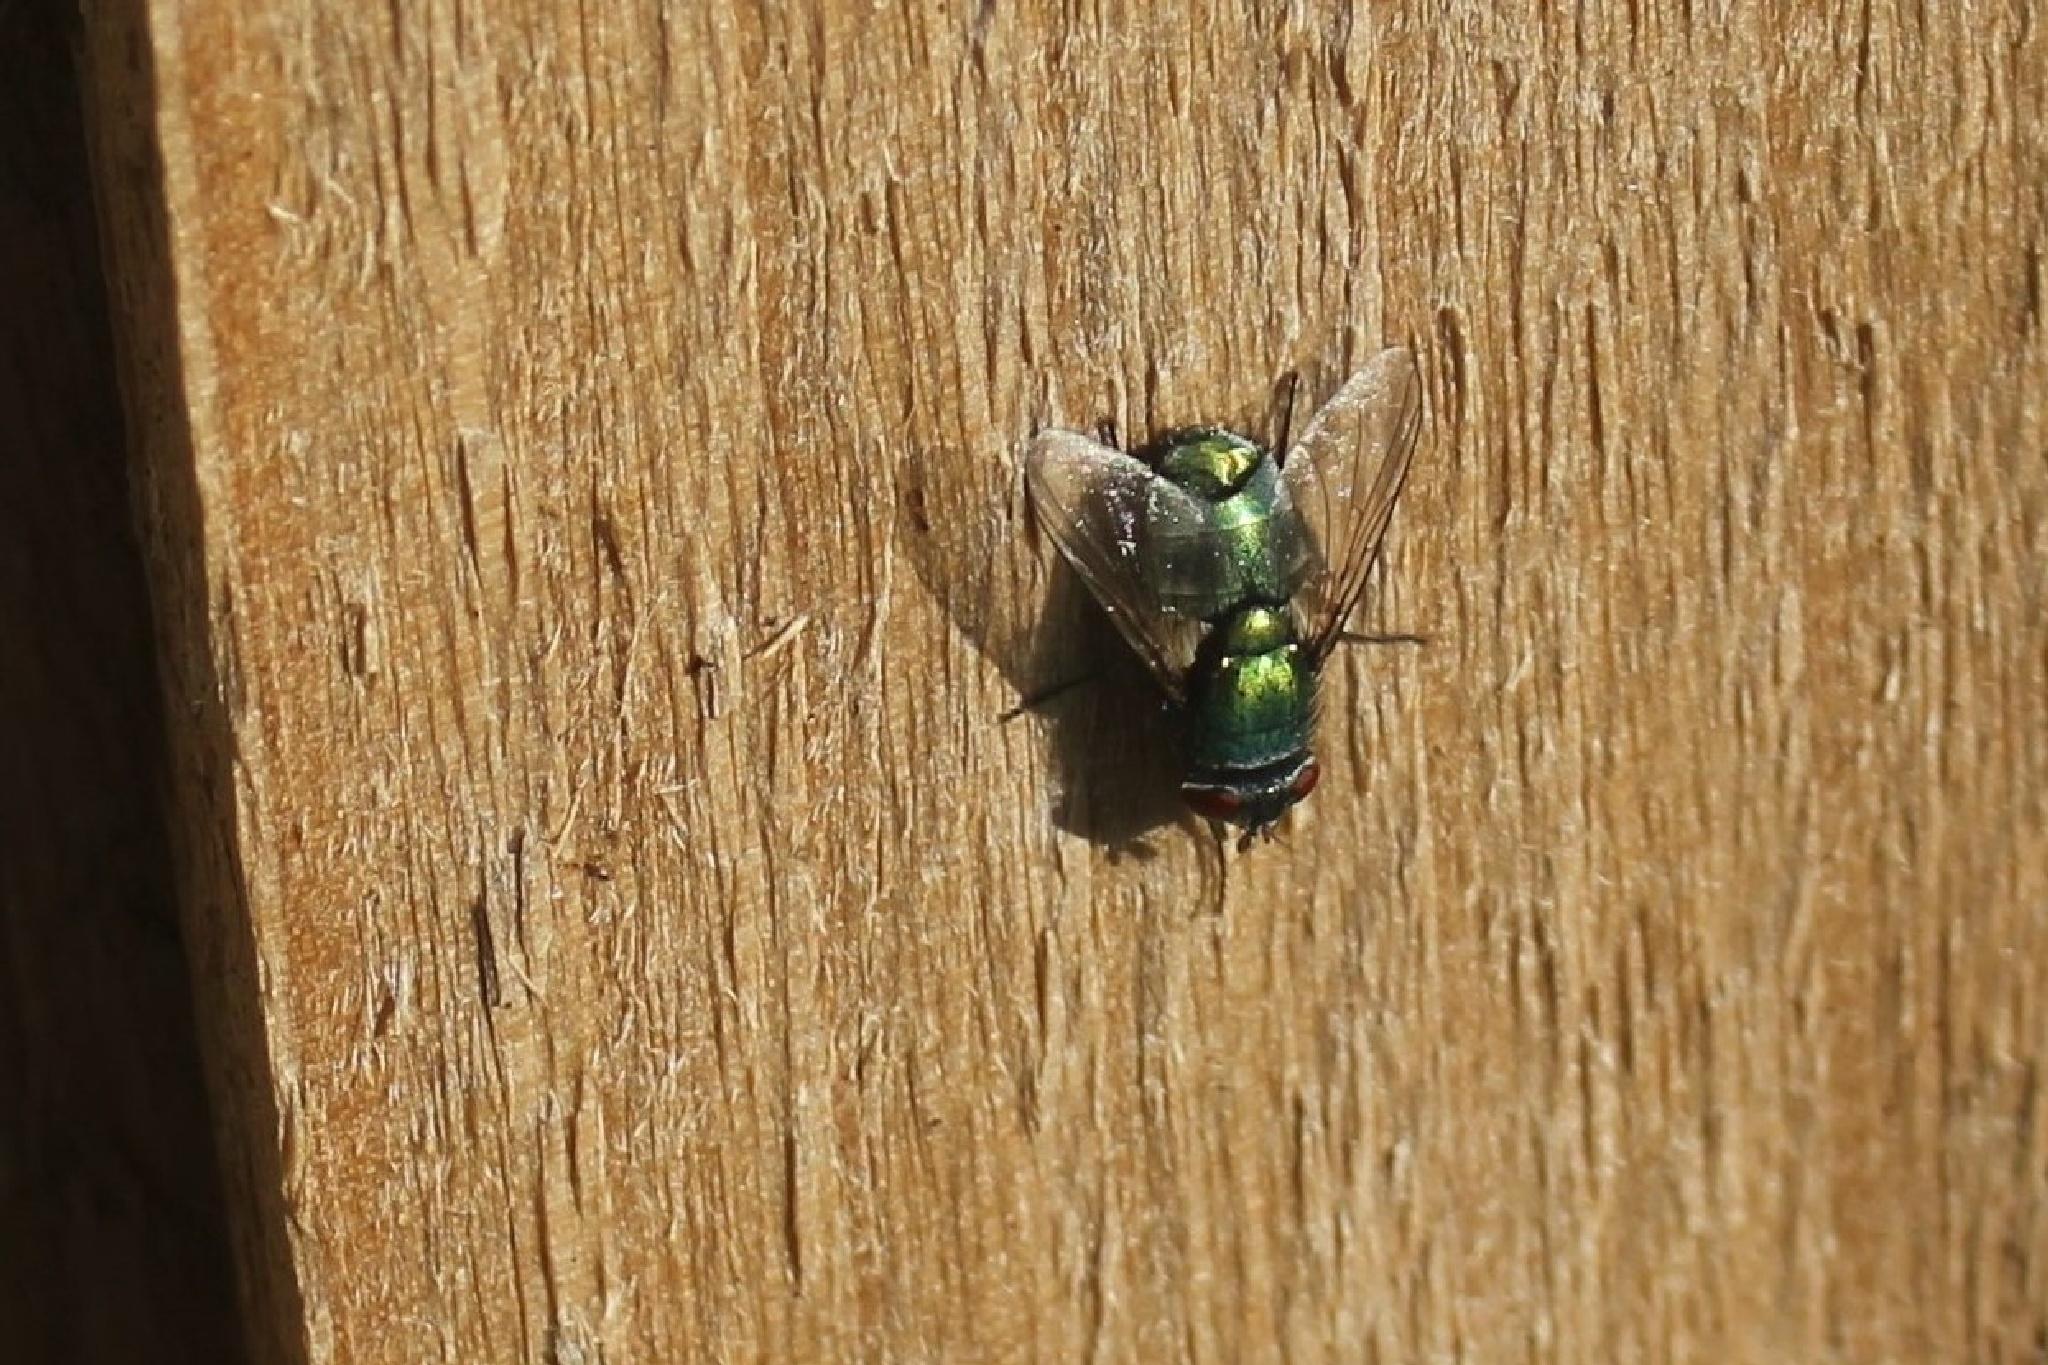 Green fly by gary.macnicol